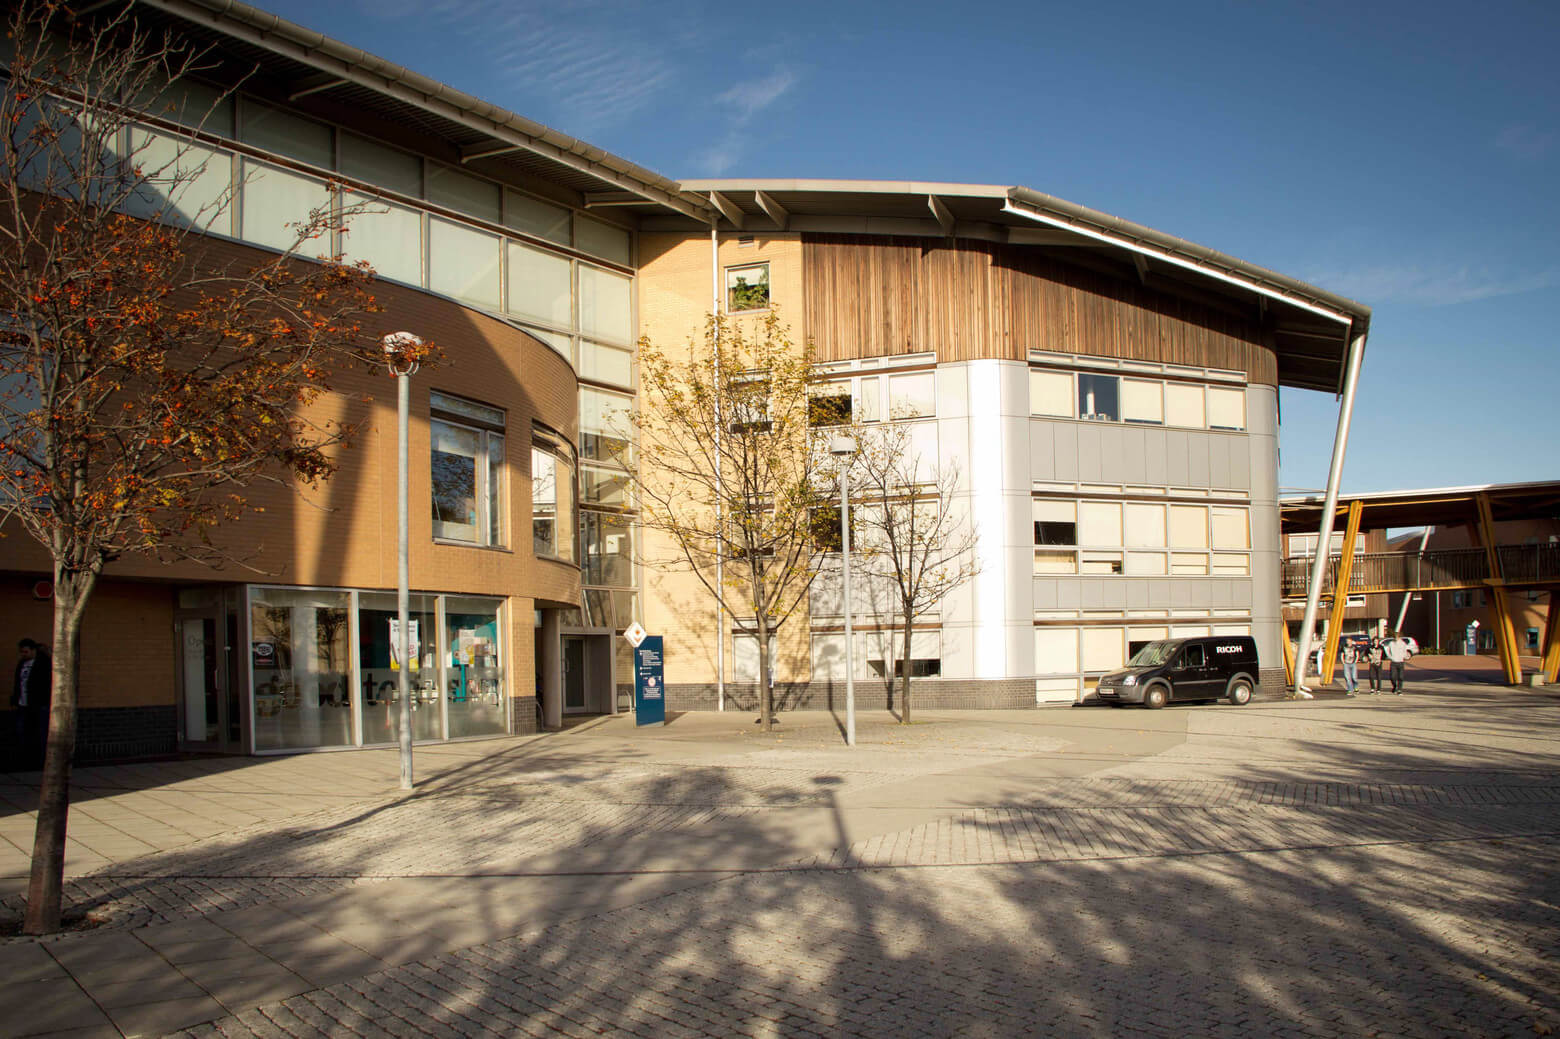 The Reg Vardy Centre